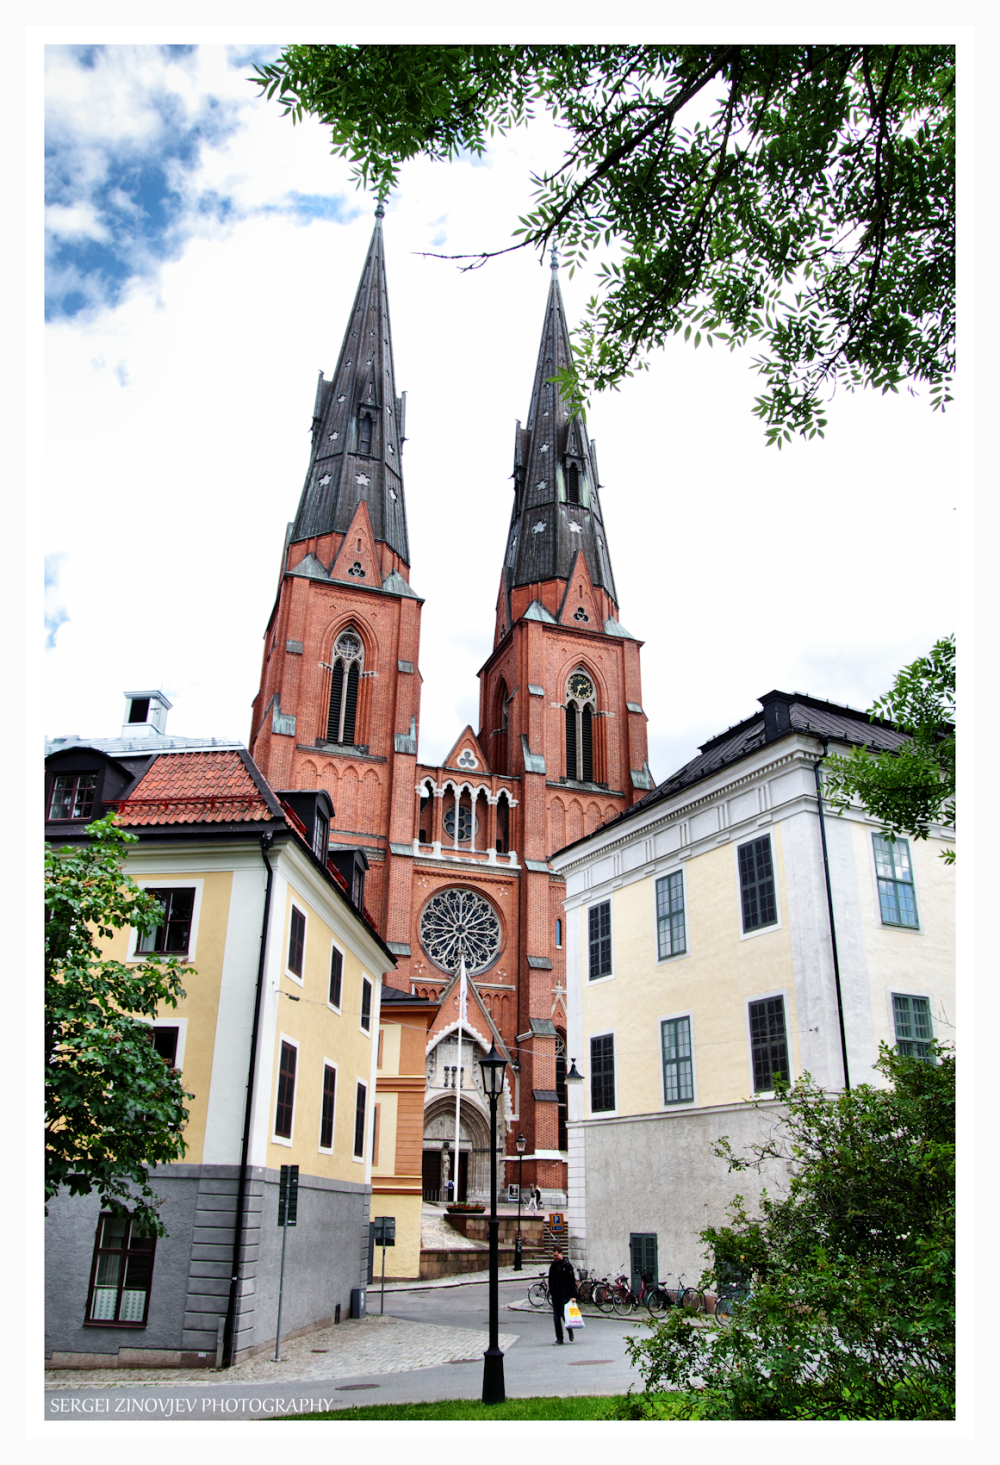 streets of Uppsala, Sweden